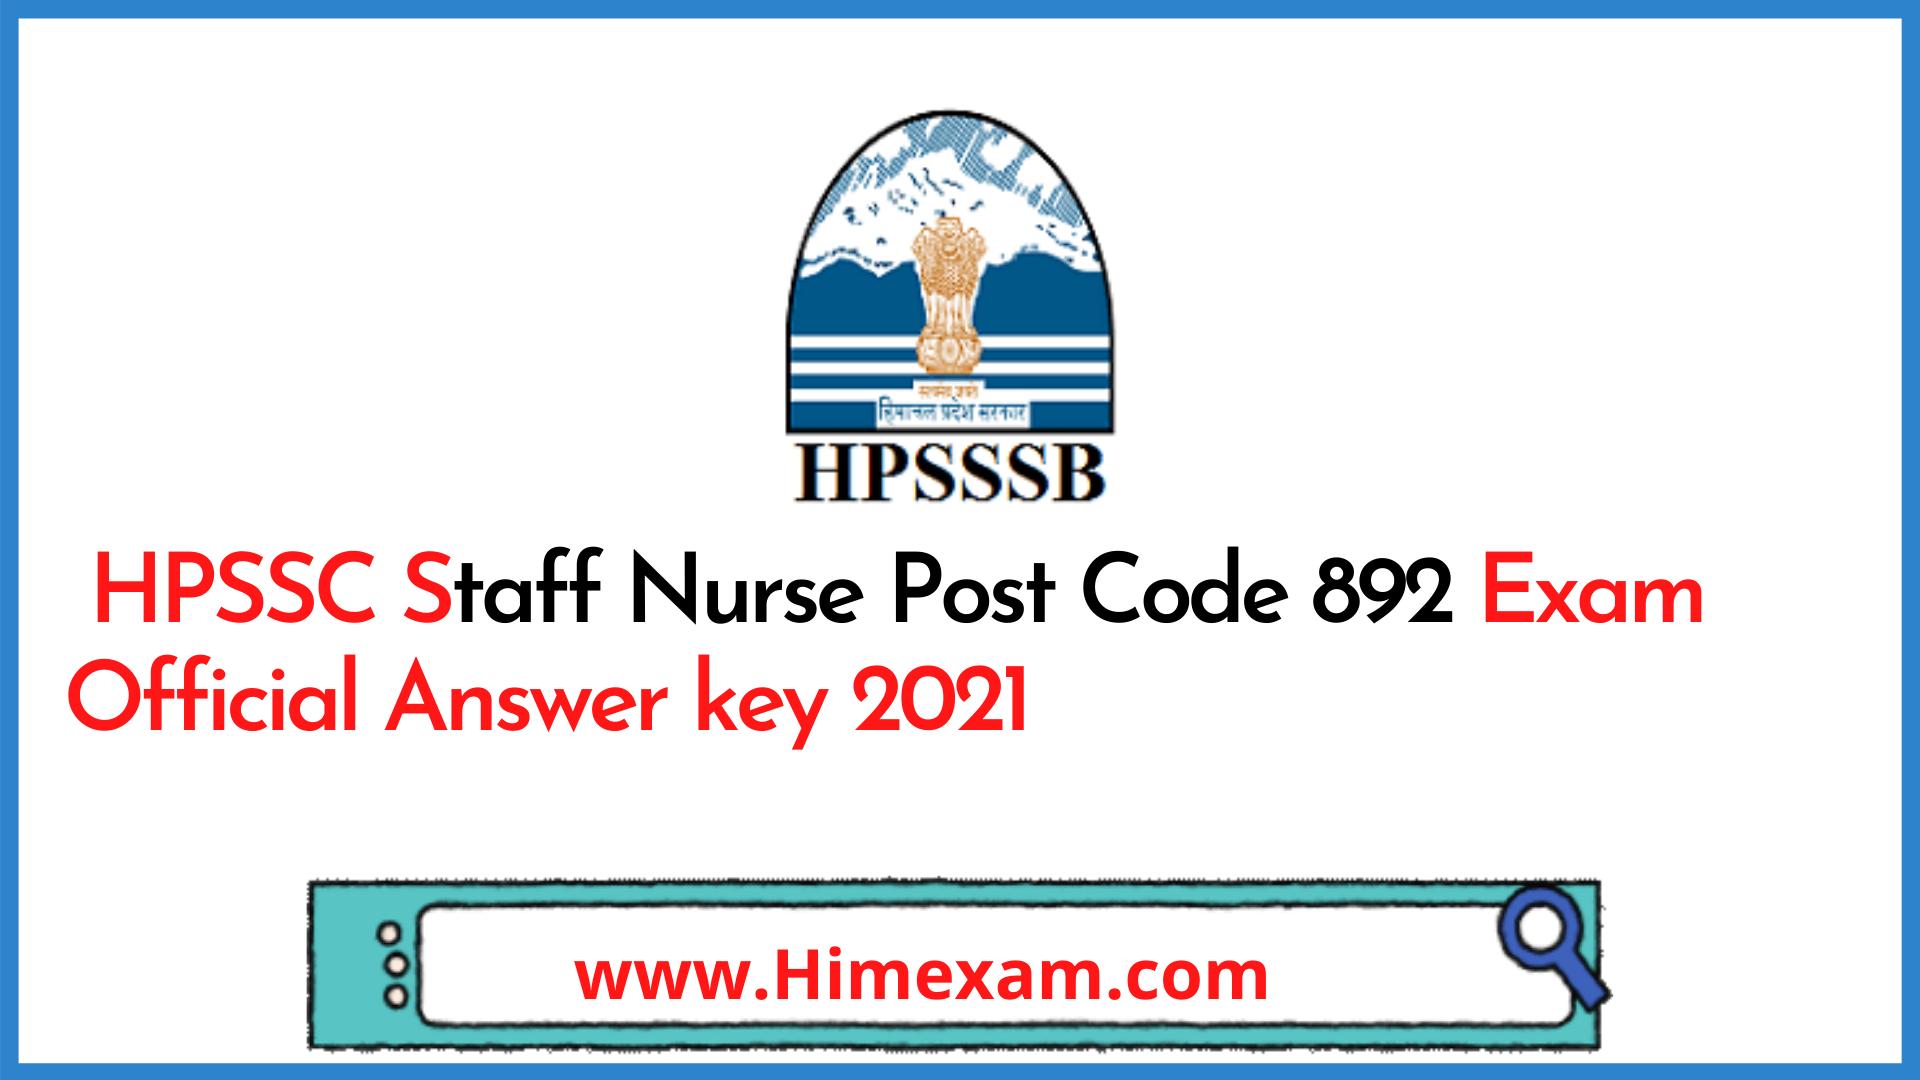 HPSSC Staff Nurse Post Code 892 Exam Official Answer key 2021